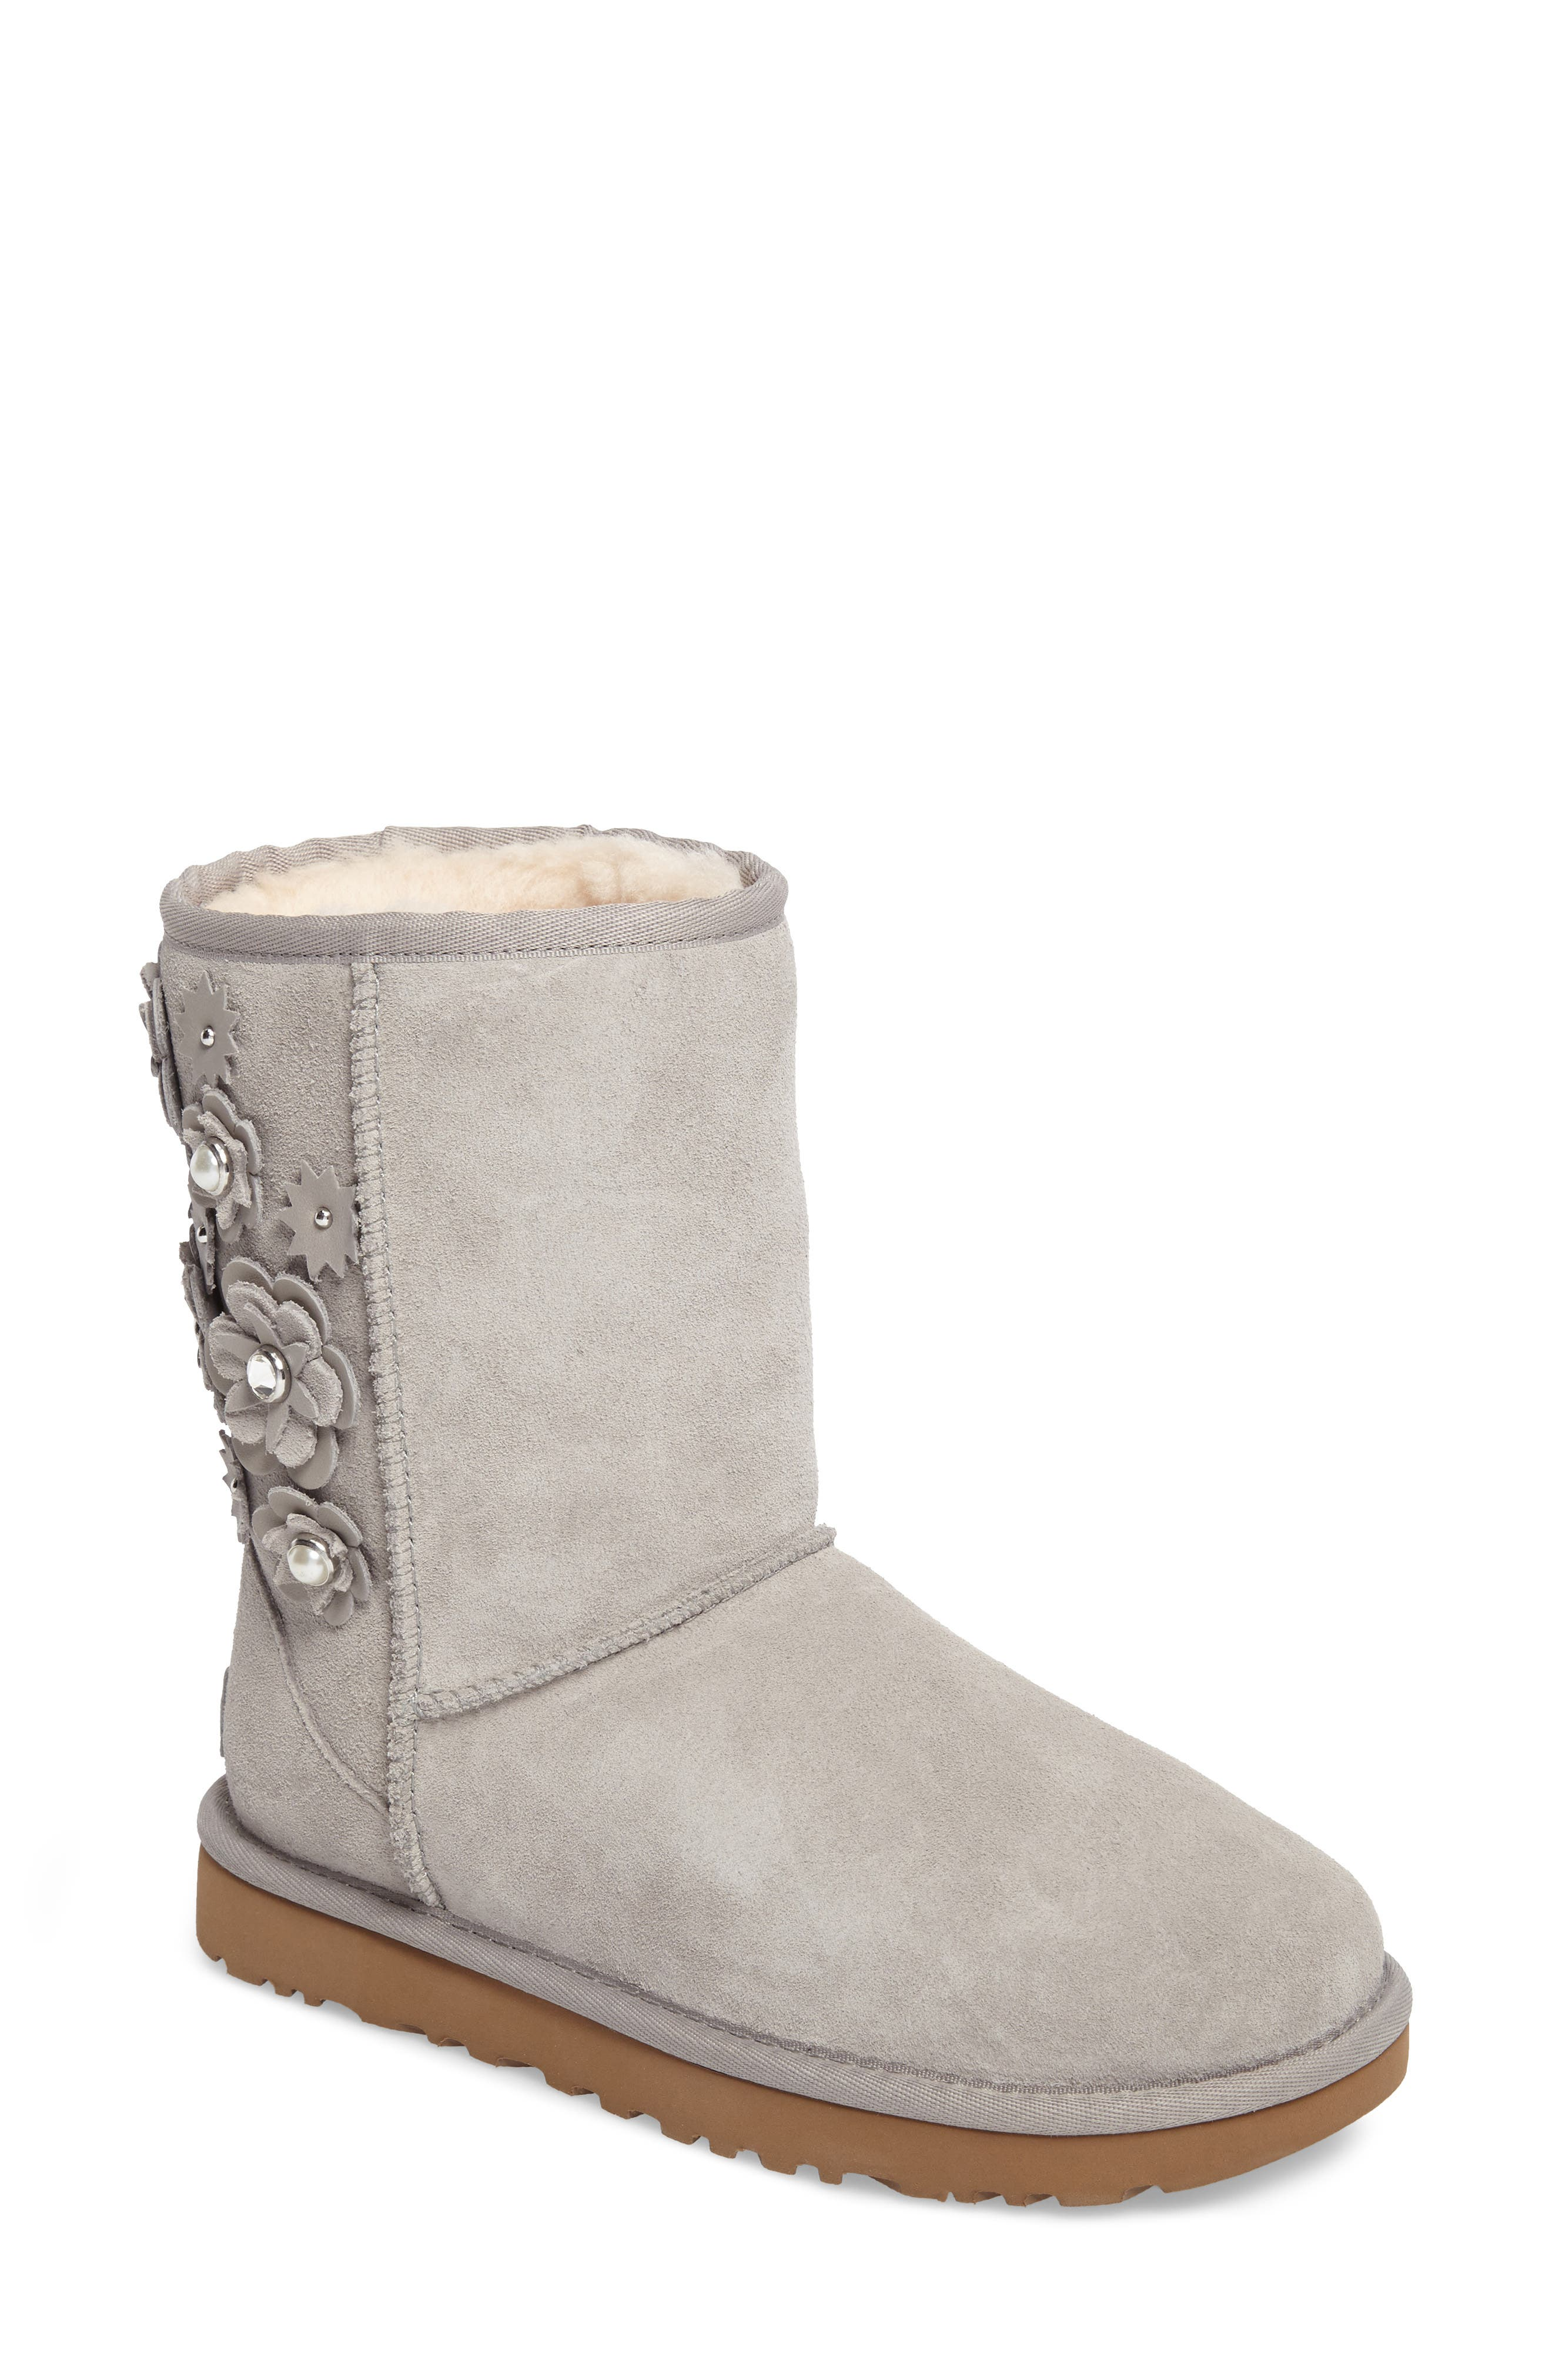 Main Image - UGG® Classic Short Petal Boot (Women)